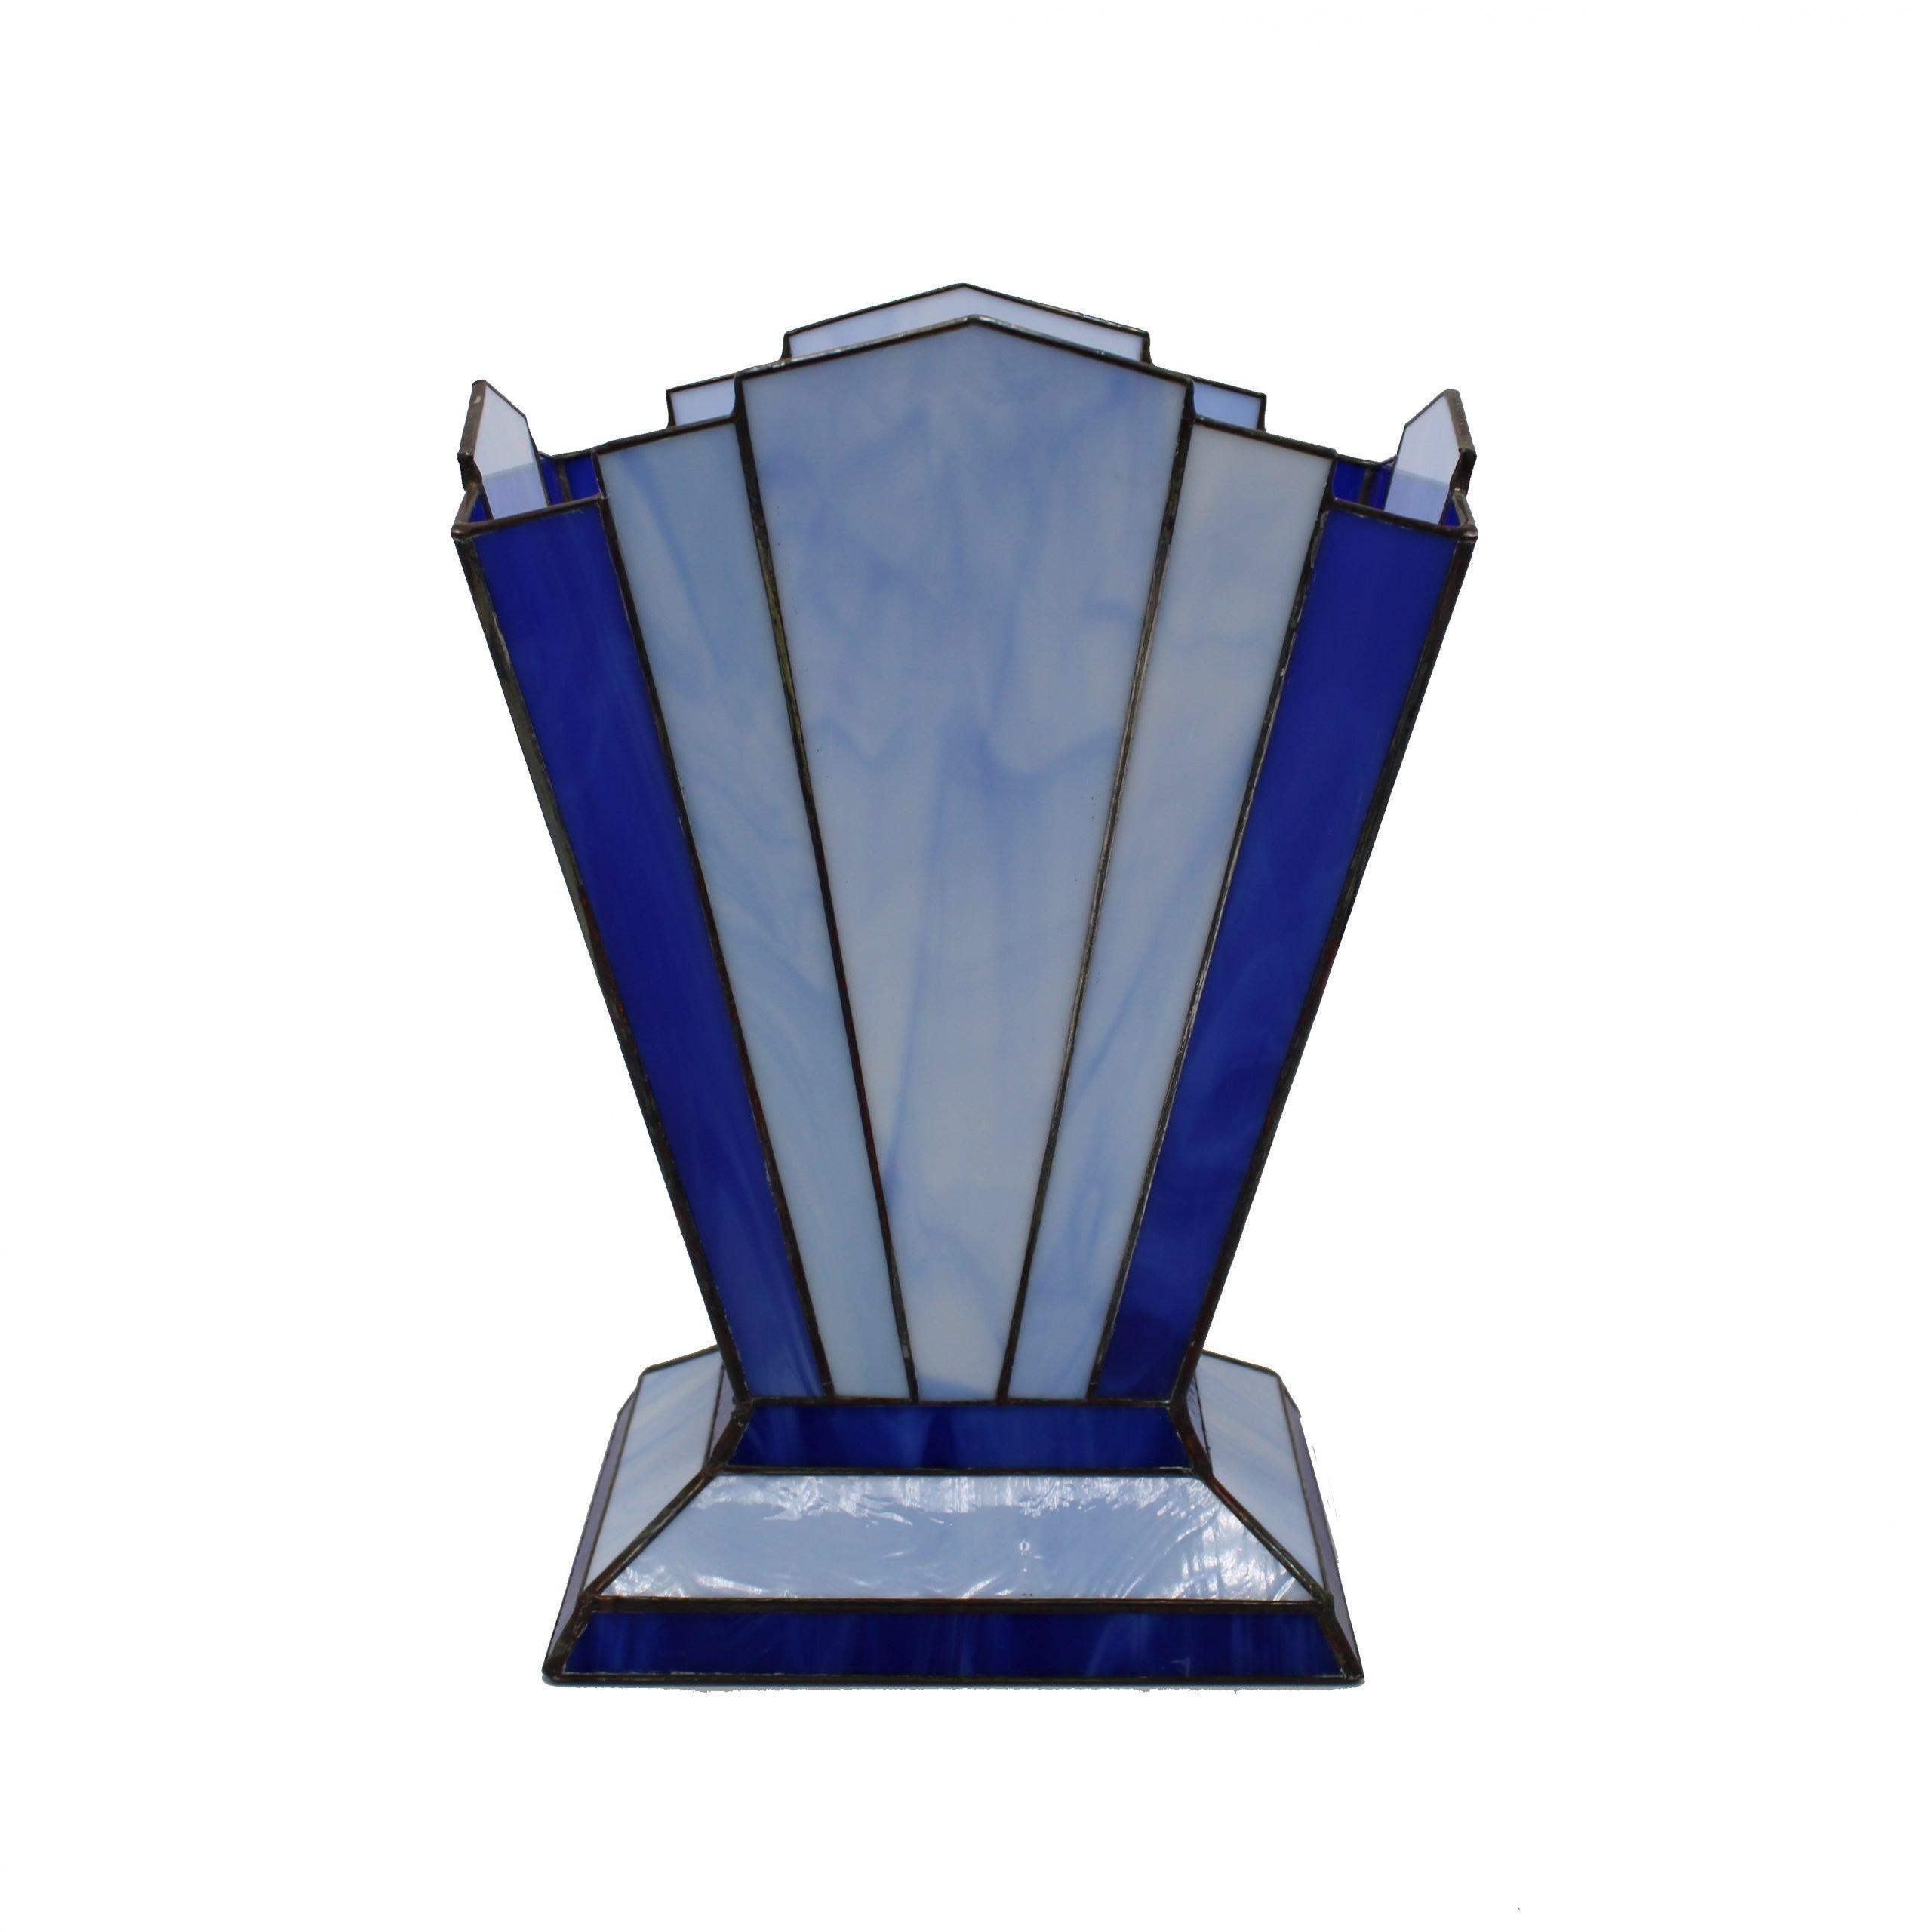 Tafellamp Zodiac Donkerblauw Blauw